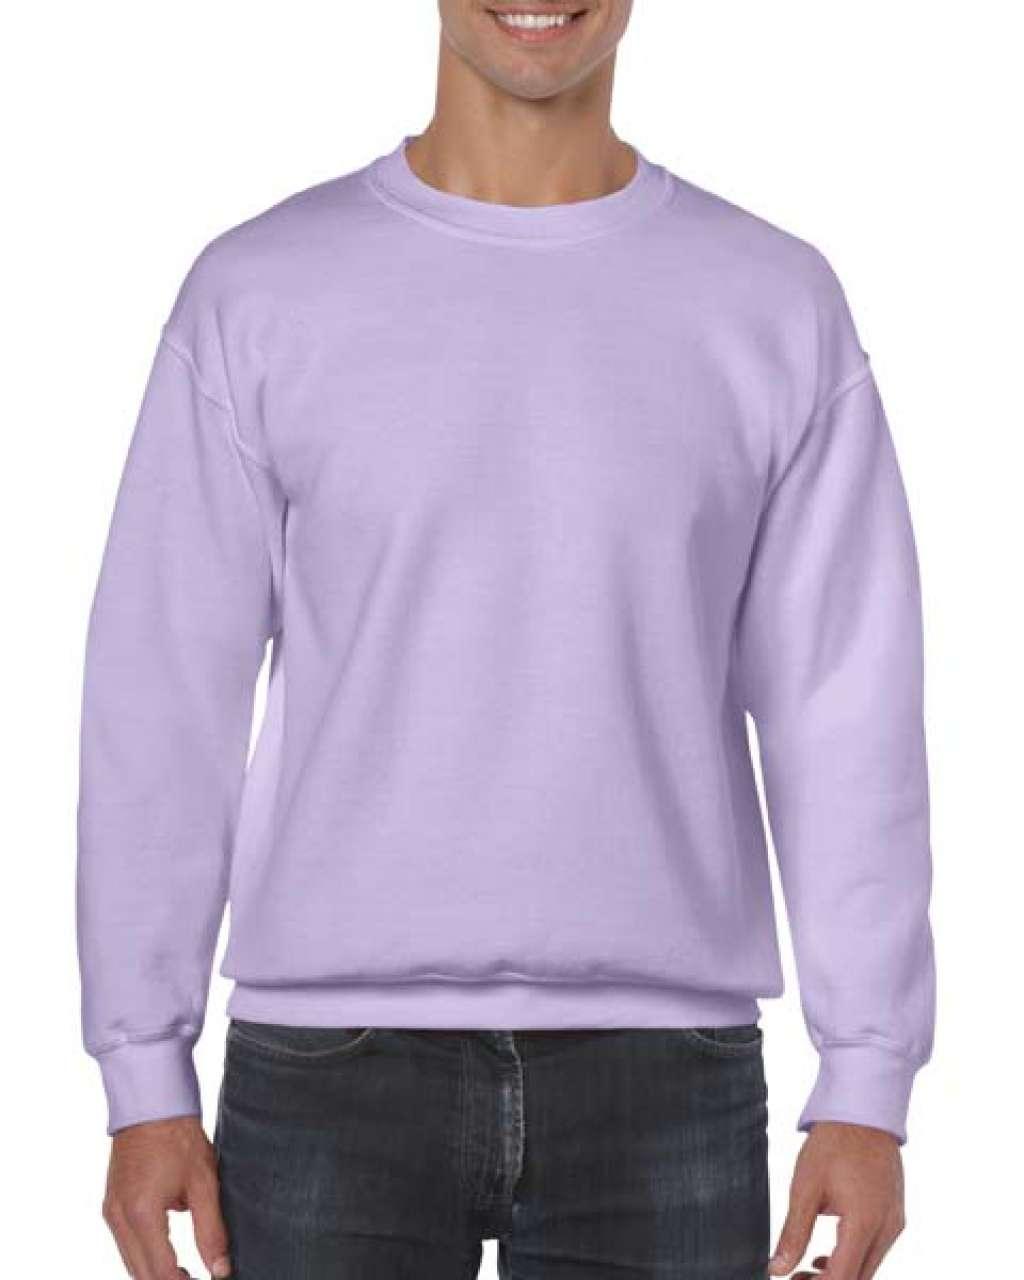 Sweater unisex Gildan Heavy Blend 50%bumbac 50%poliester 271 g/mp interior pufos serigrafie broderie termotransfer | Toroadv.ro